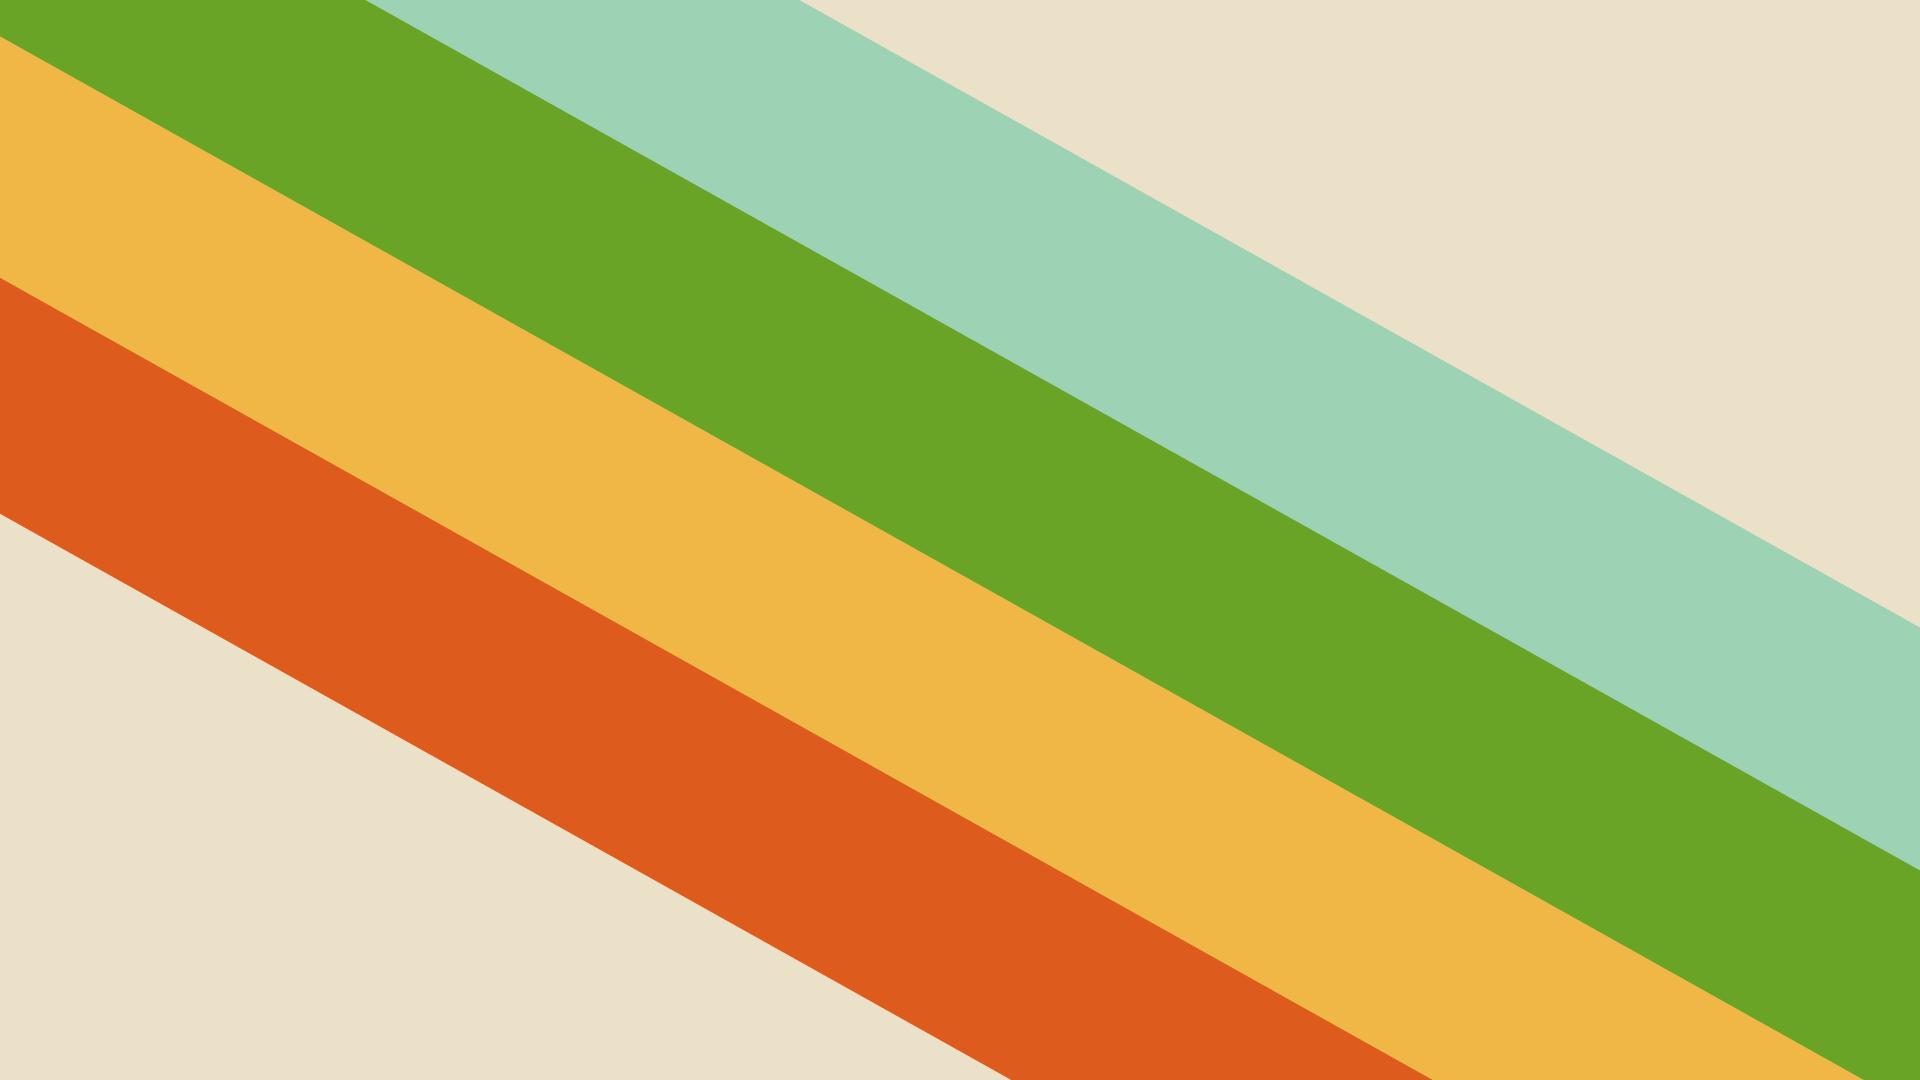 best desktop wallpaper lifehacker   wwwwallpapers in hdcom 1920x1080